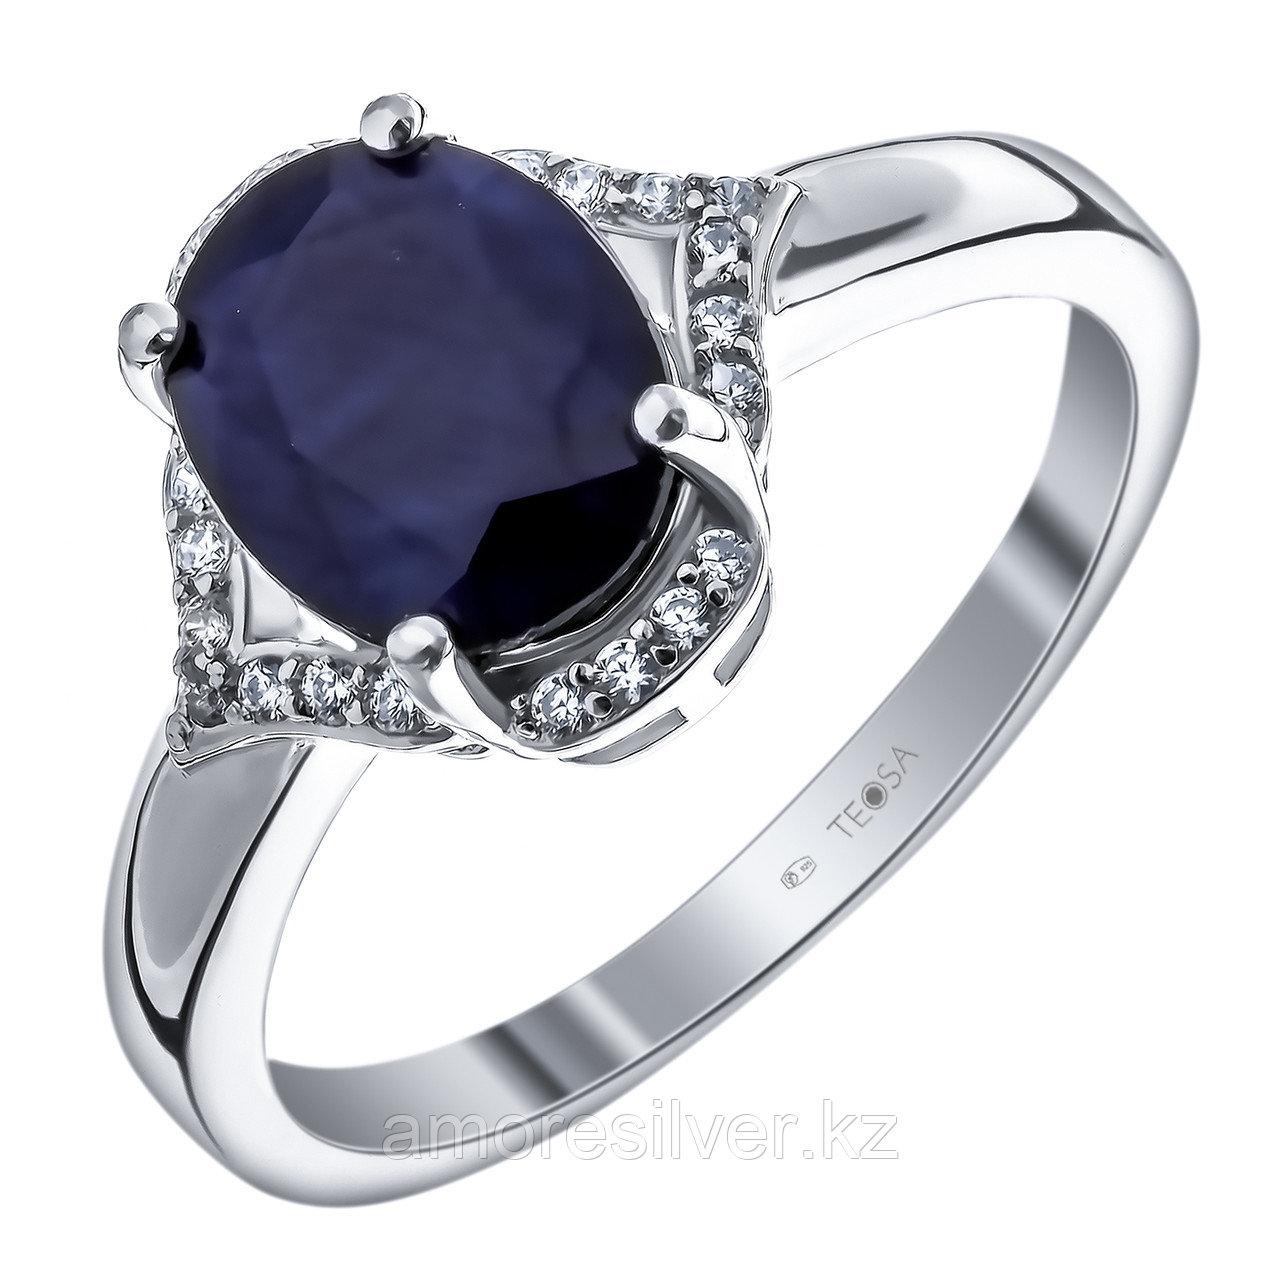 "Кольцо Teosa серебро с родием, сапфир топаз, ""halo"" R-DRGR00398-SP-T"